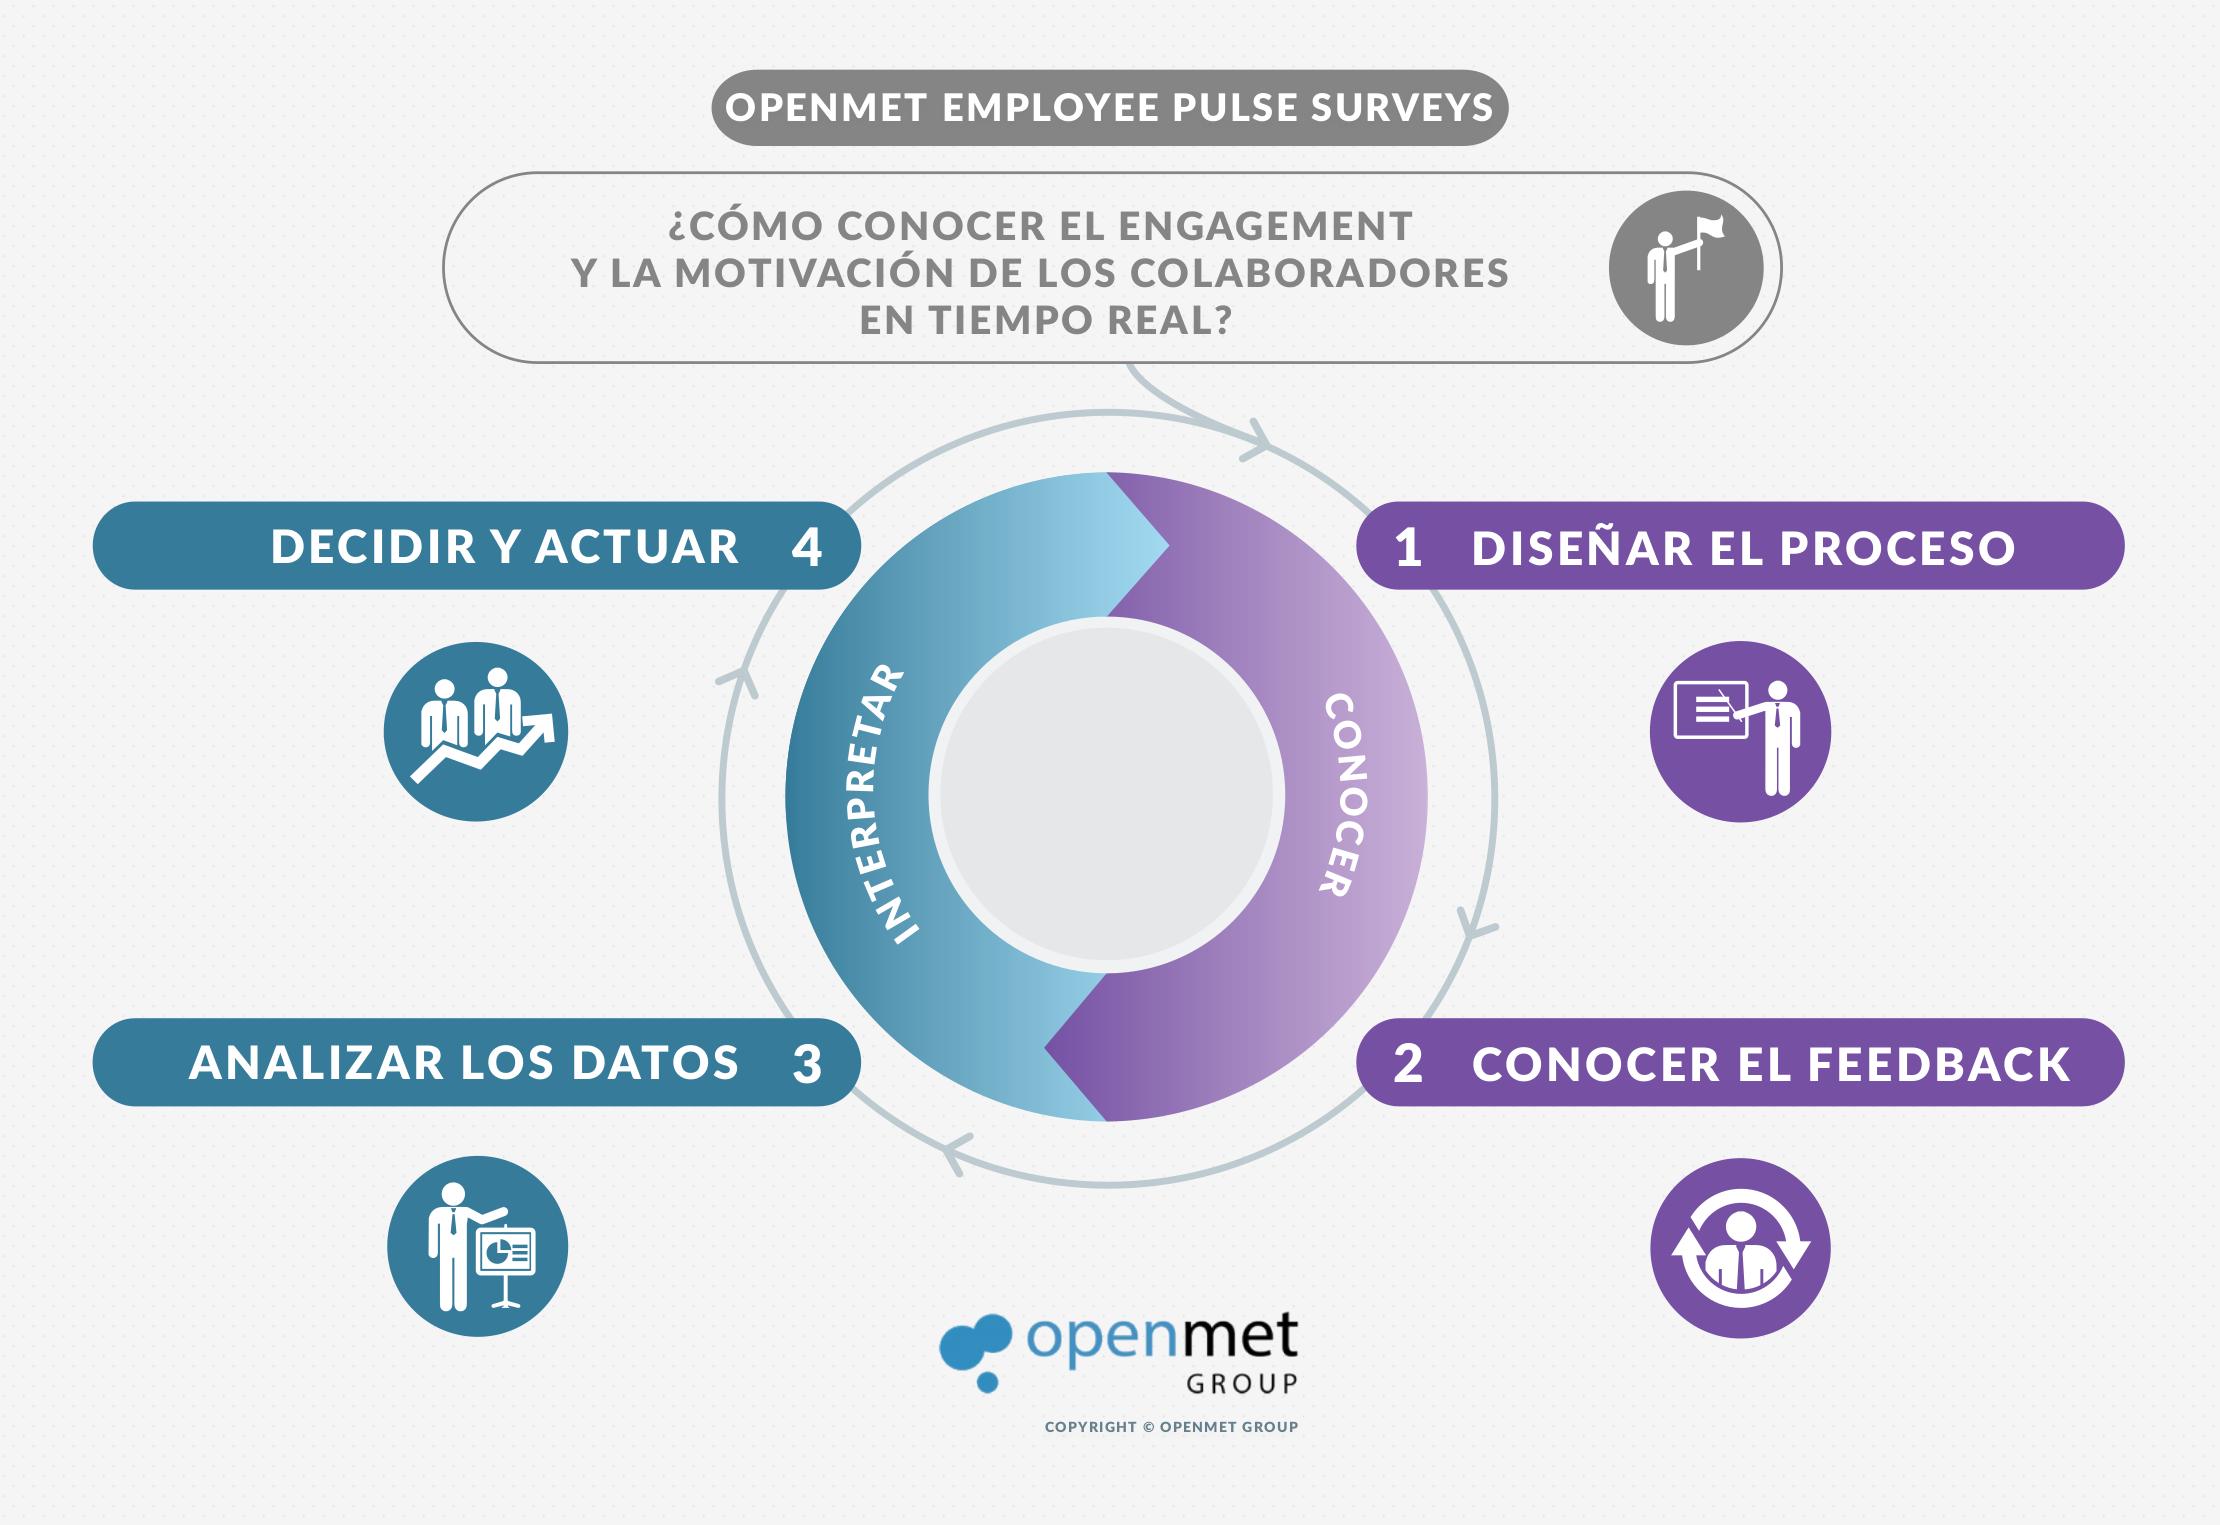 Openmet EmployeePS